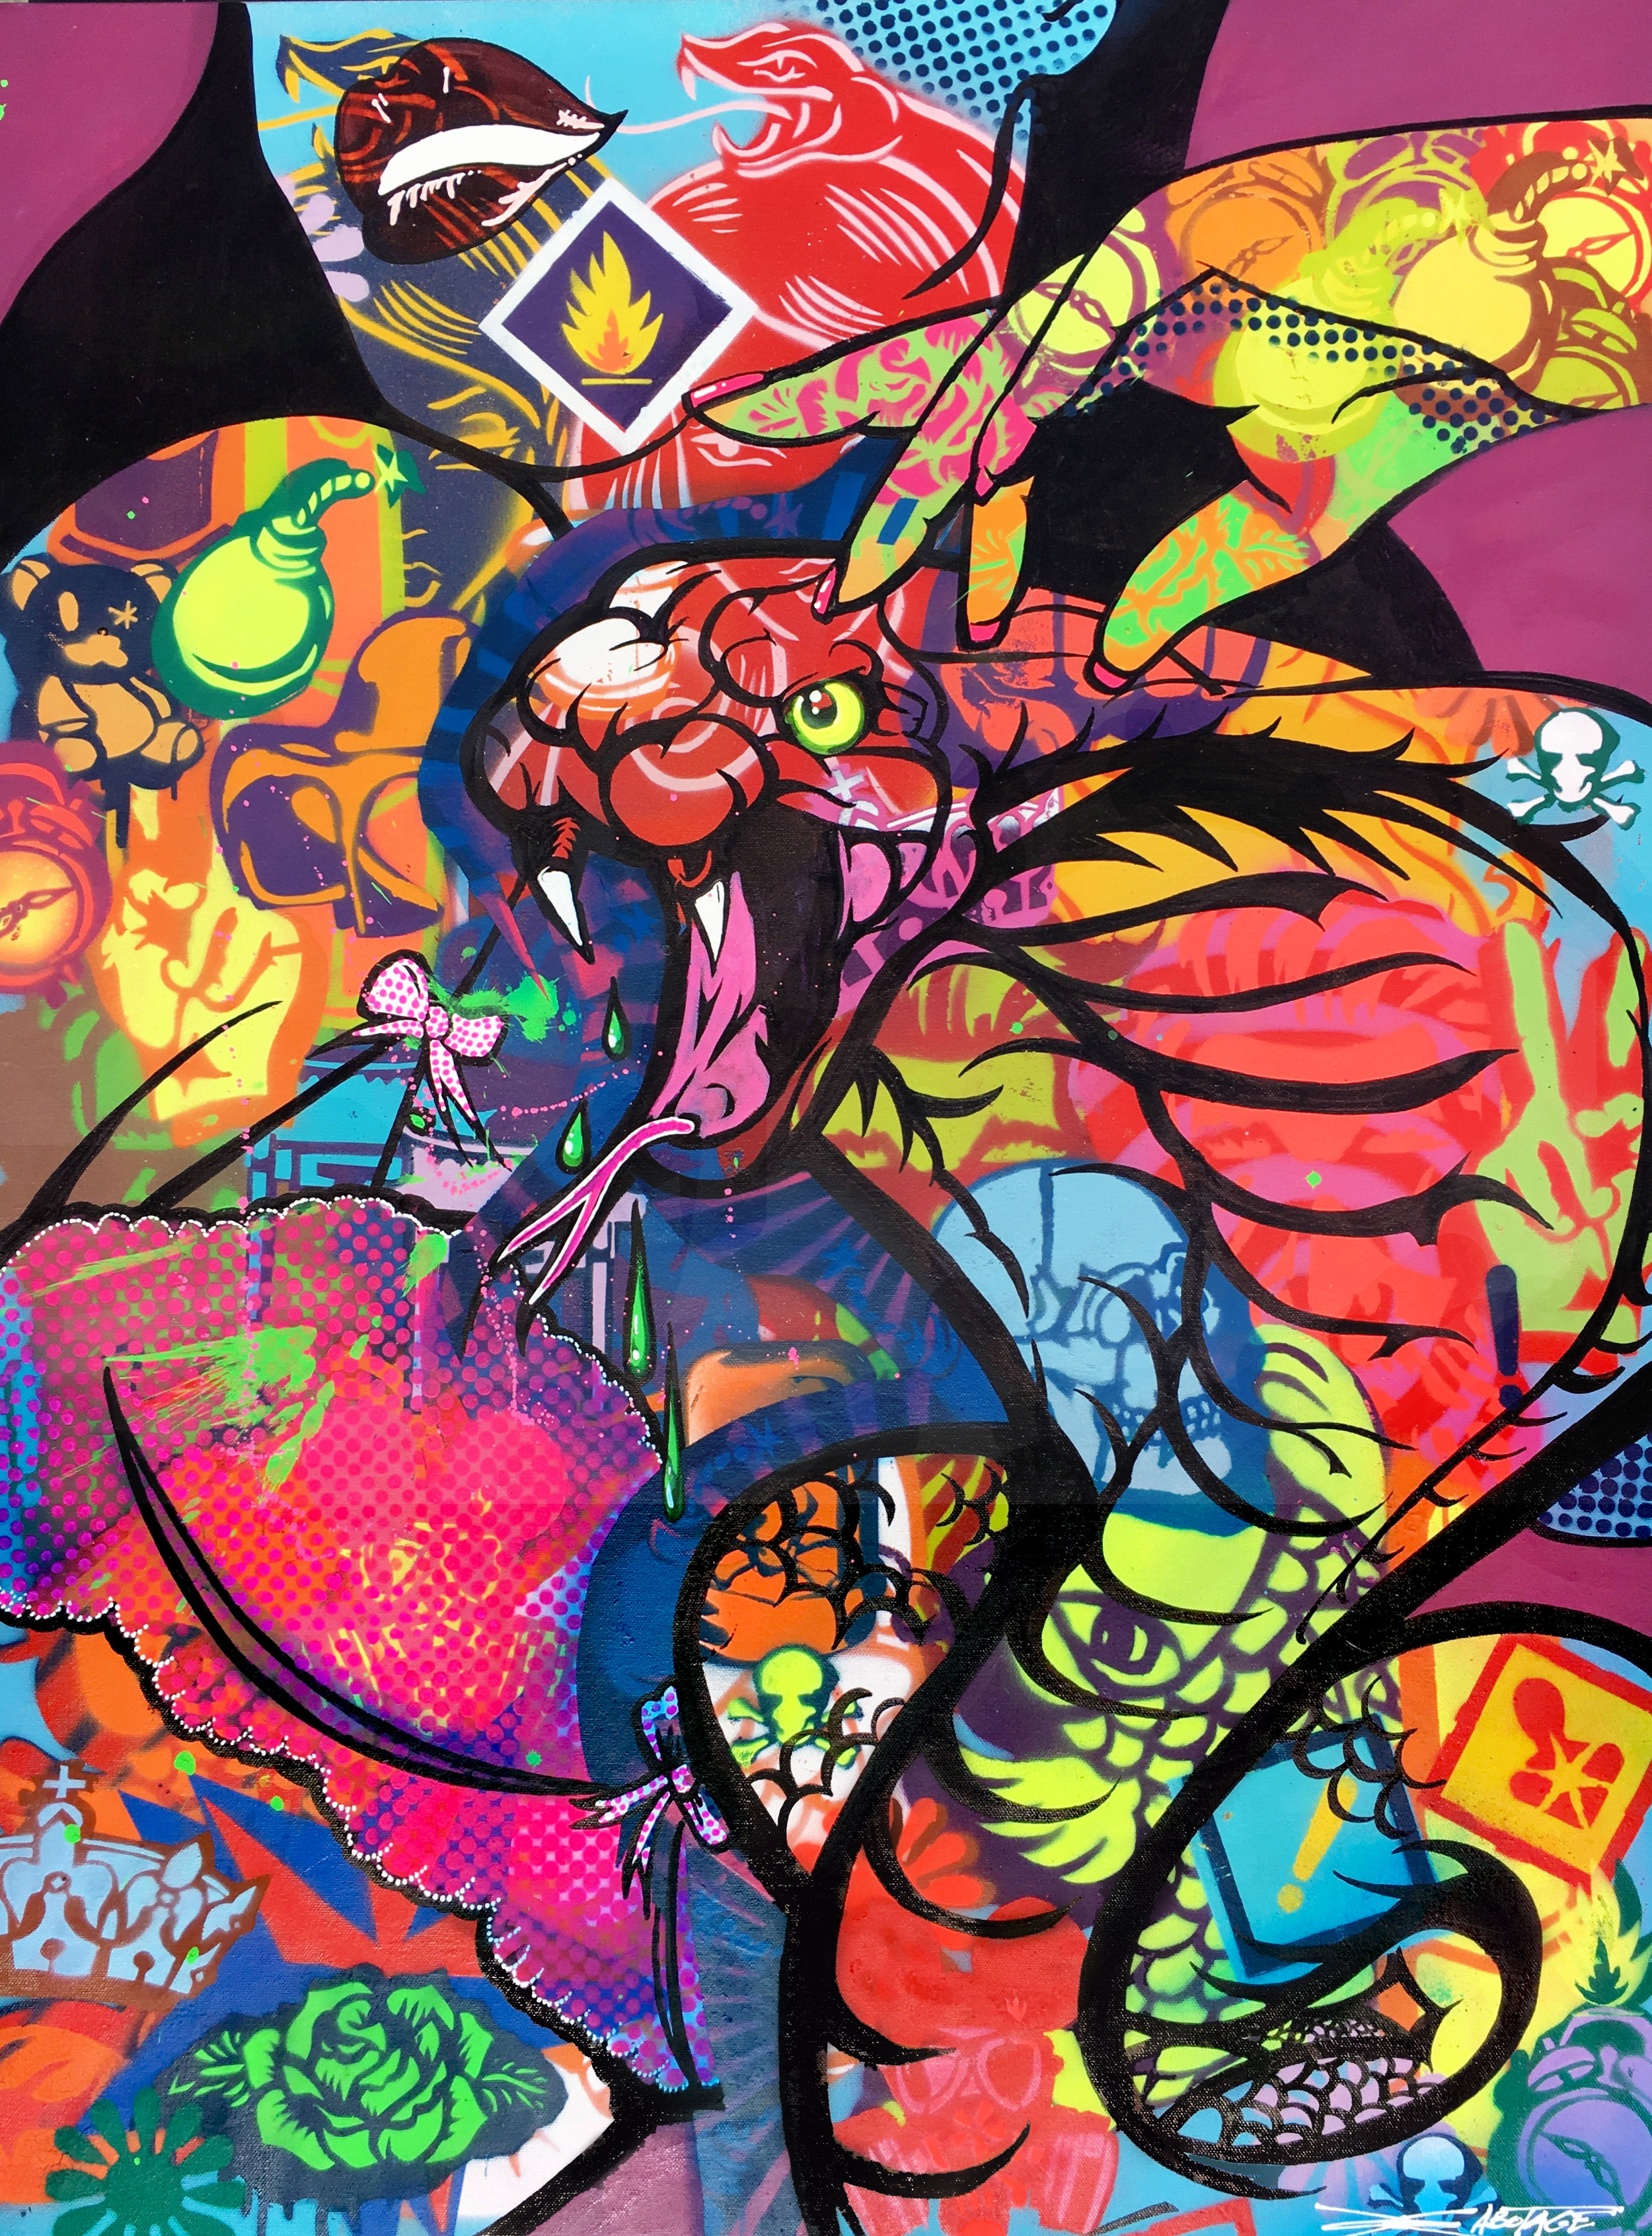 """Venomous Love Hiss Hiss"" Spray paint stencil and graffiti markers 61 x 90 cm 2018"